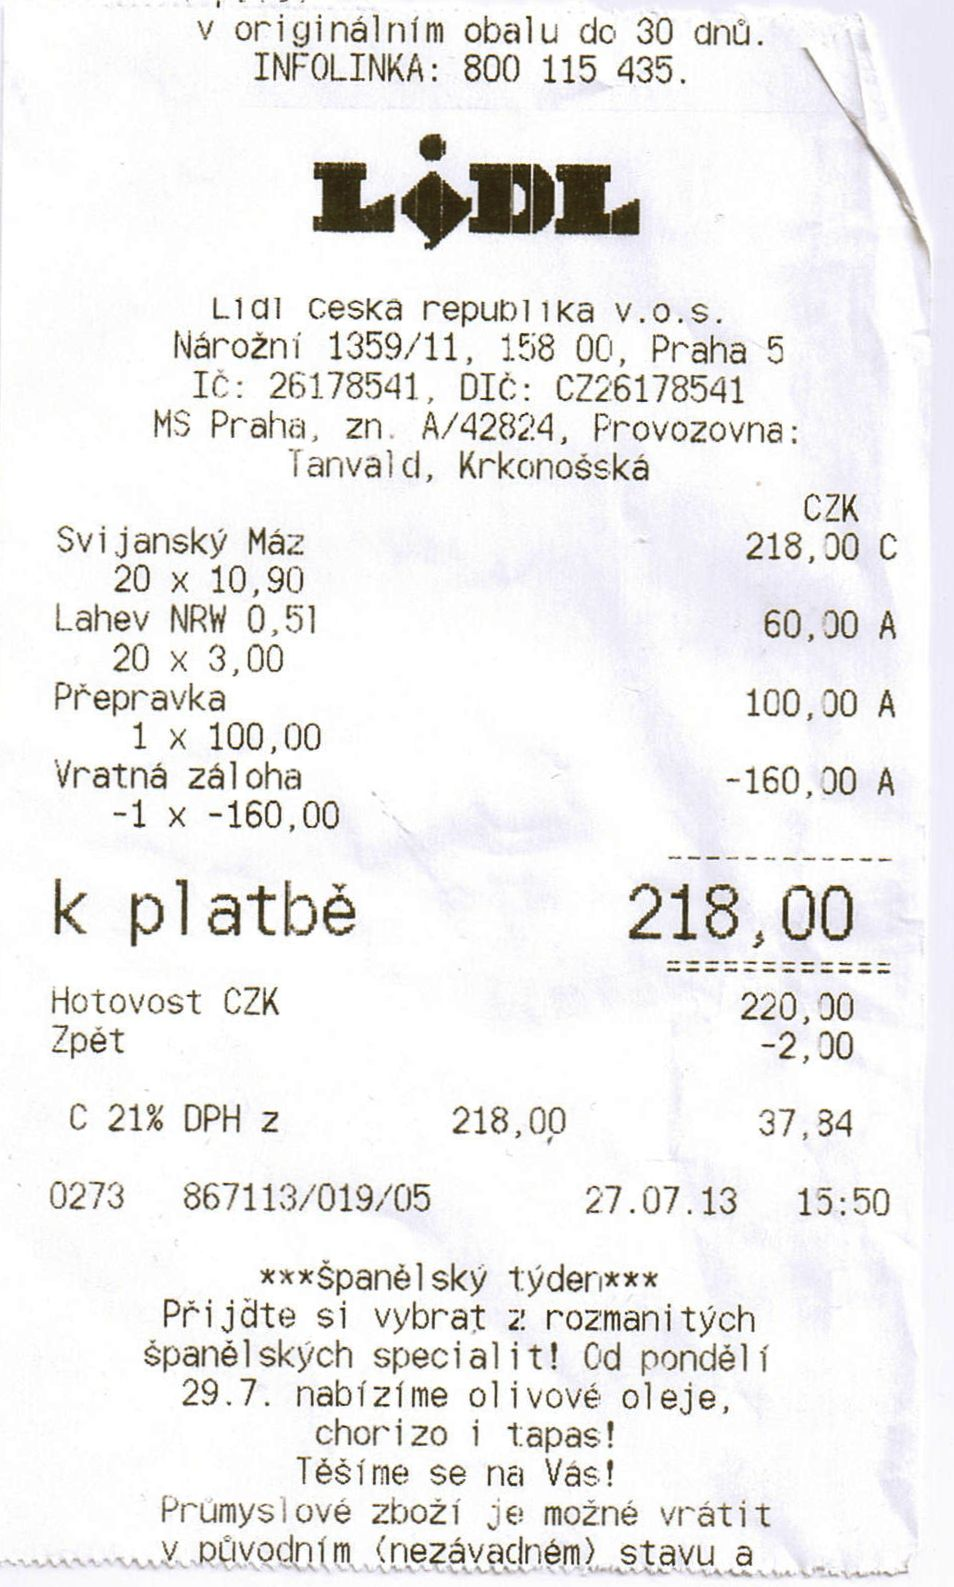 File Uctenka Lidl Jpg Wikimedia Commons